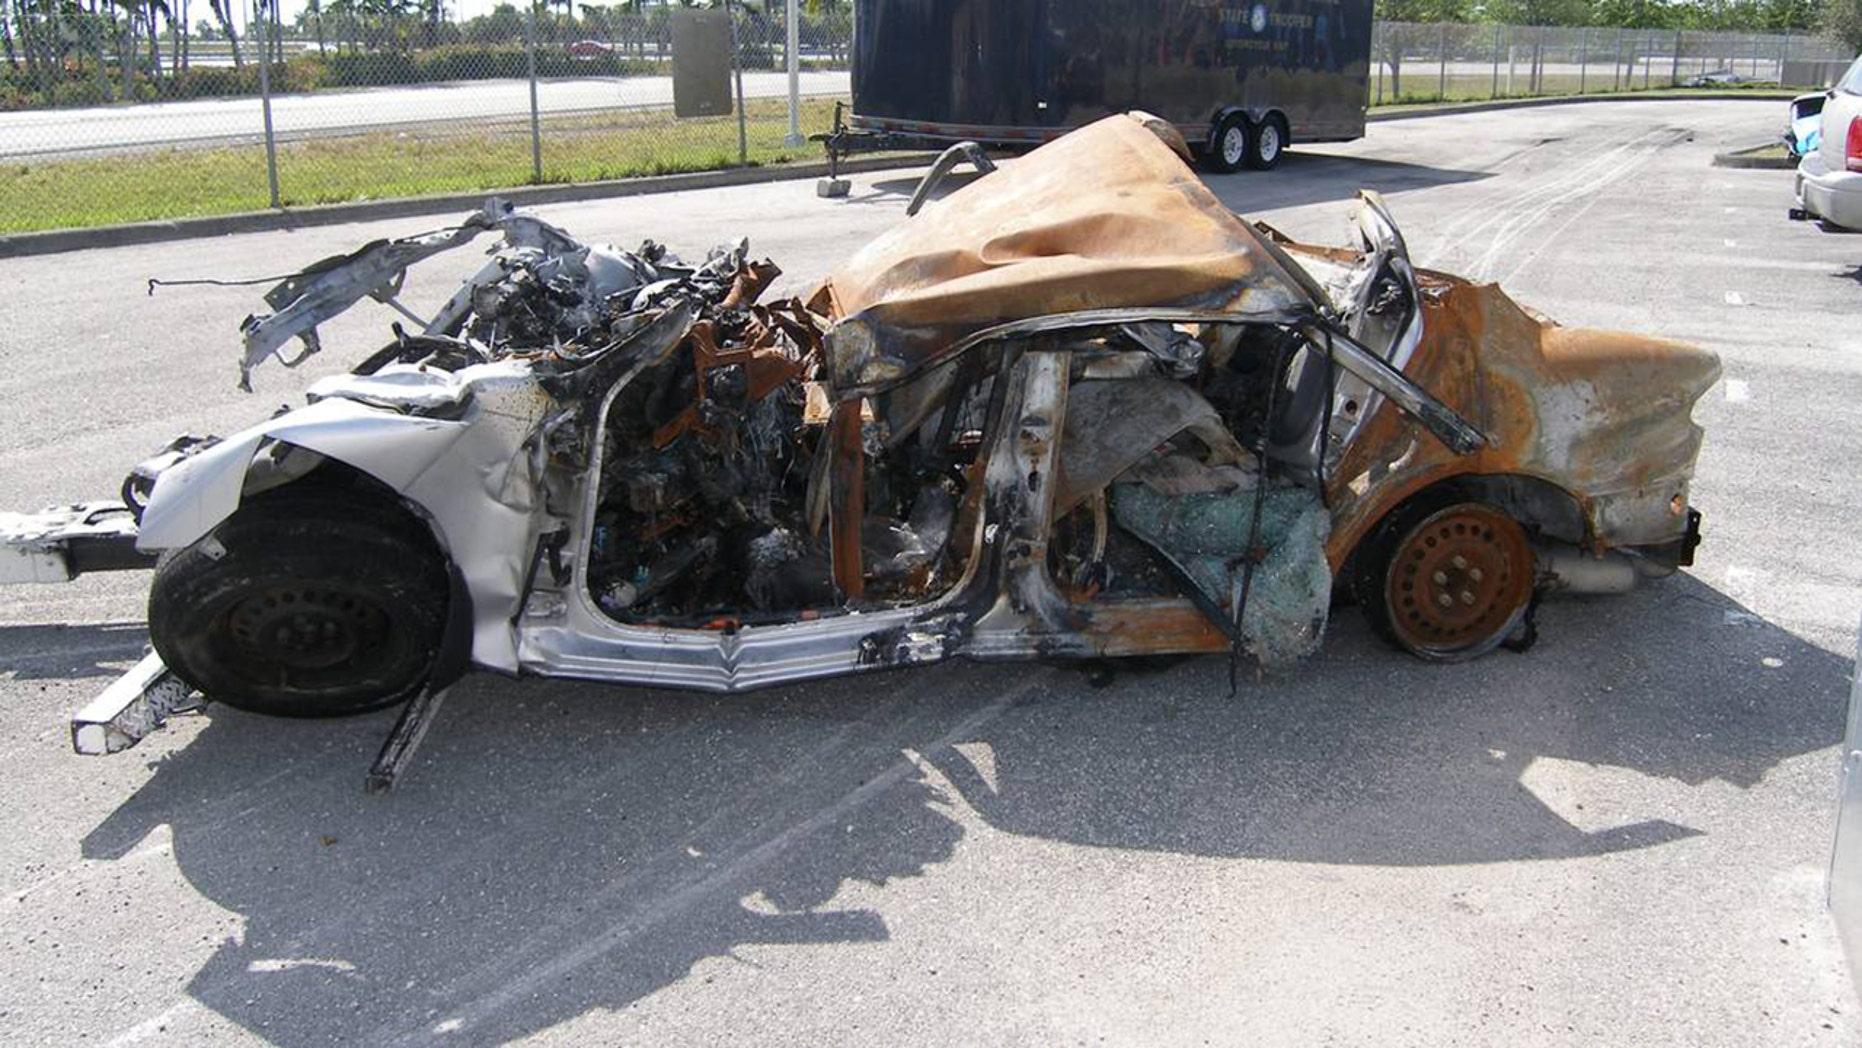 Three People Die In Single-Car Crash - whio.com